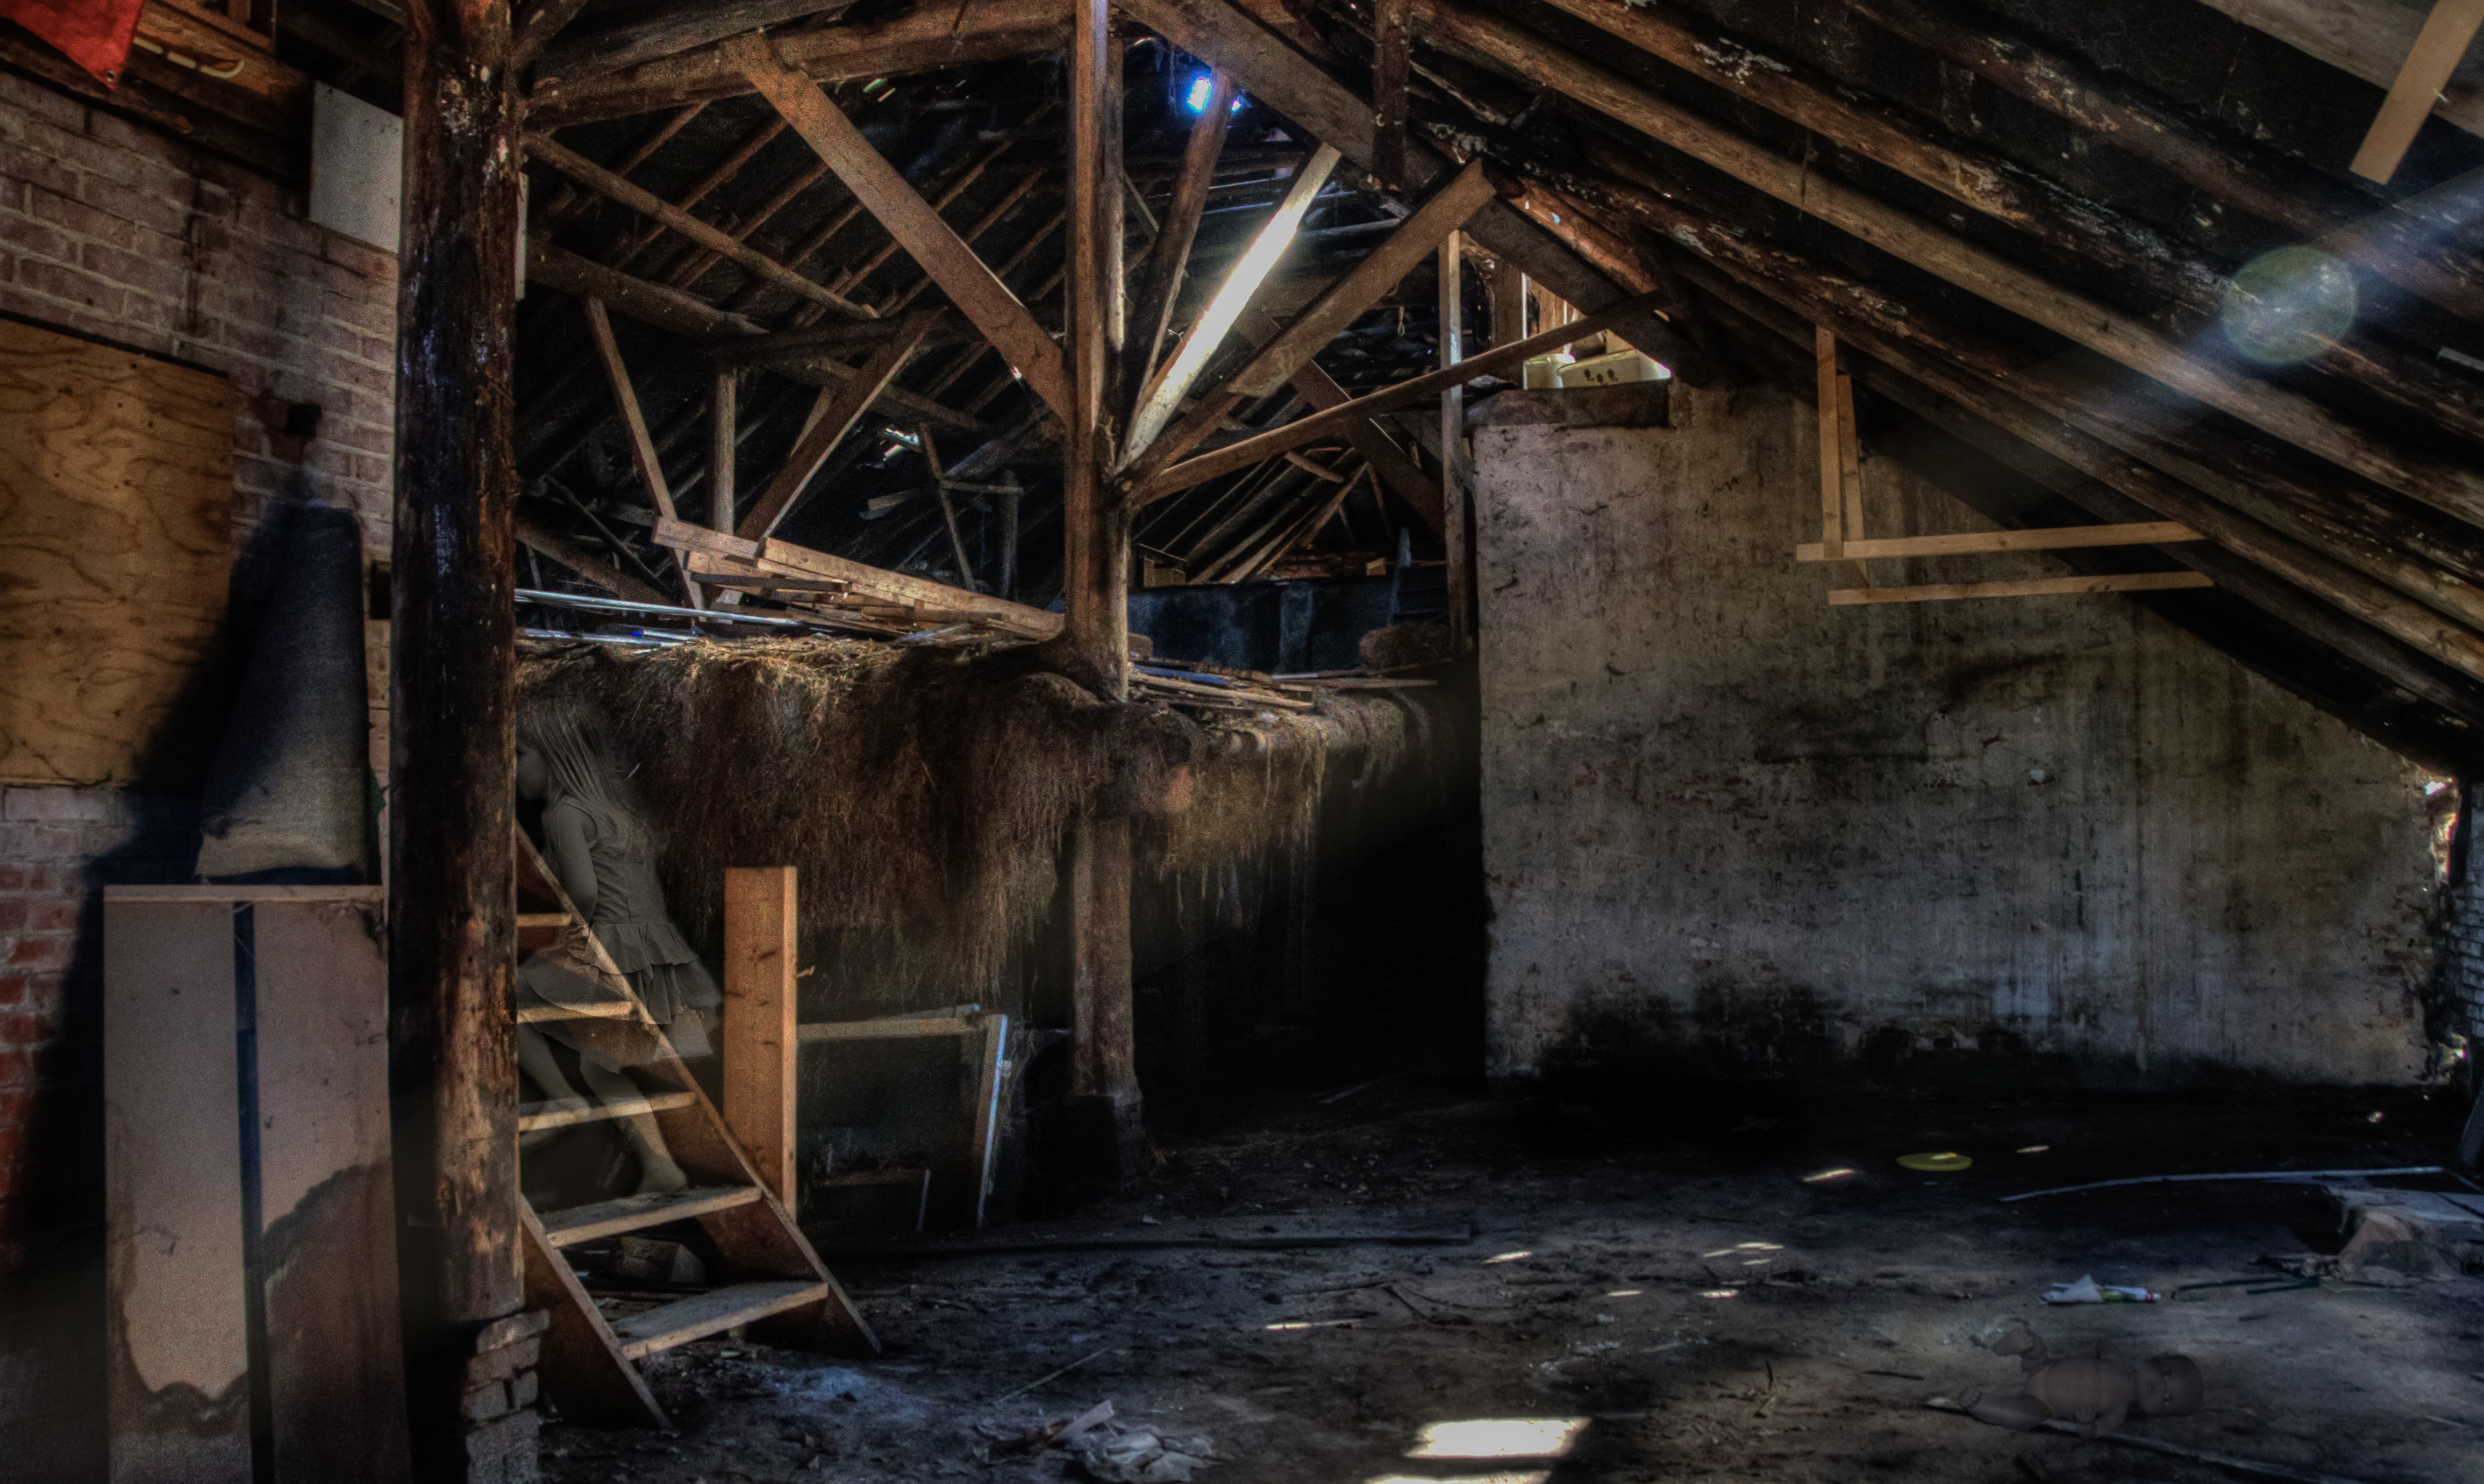 100 Amazing Barn Photos 183 Pexels 183 Free Stock Photos